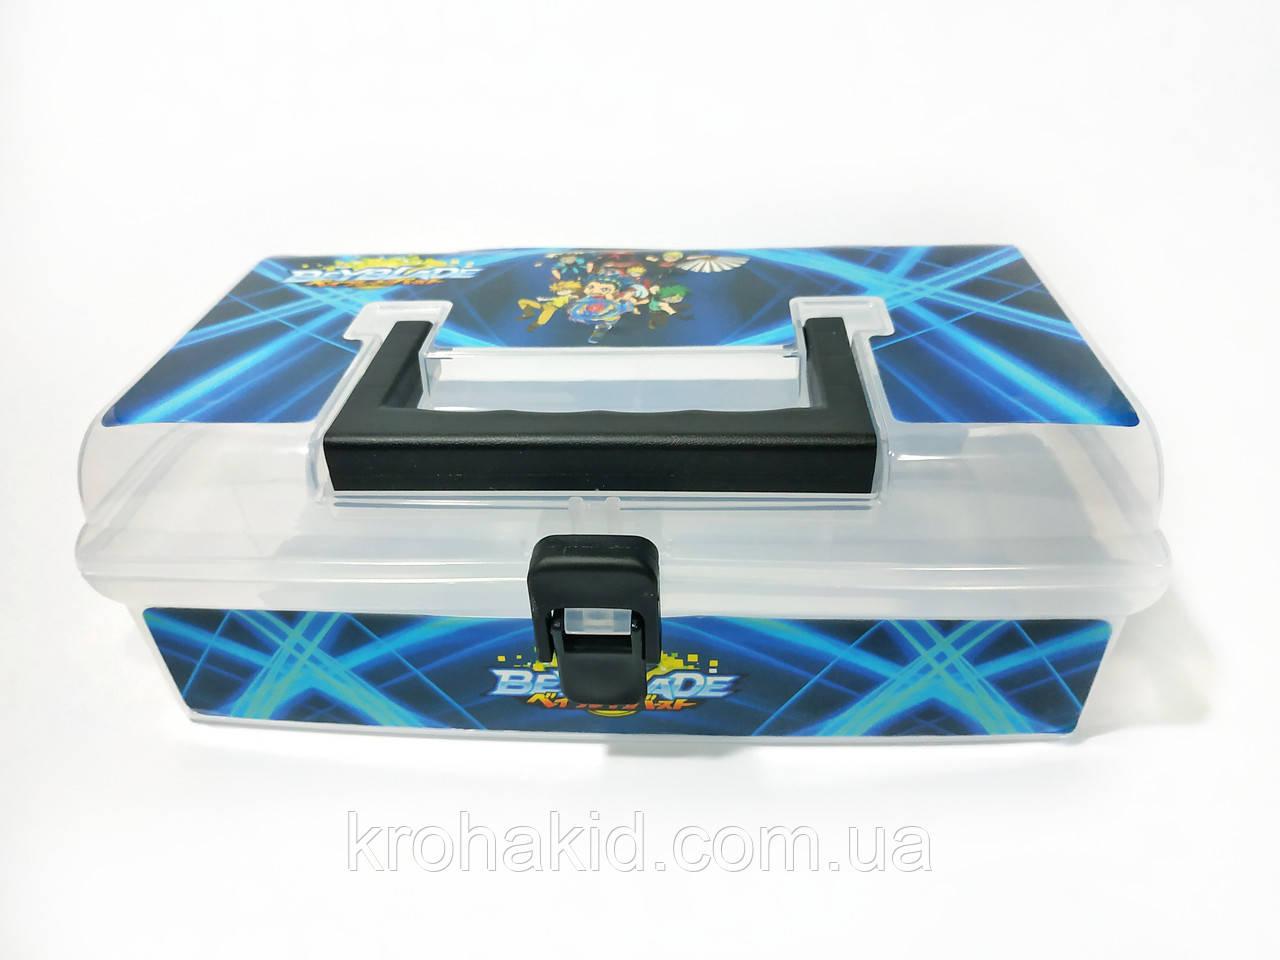 Кейс для BeyBlade / чемодан для волчков бейблейд (прозрачный)